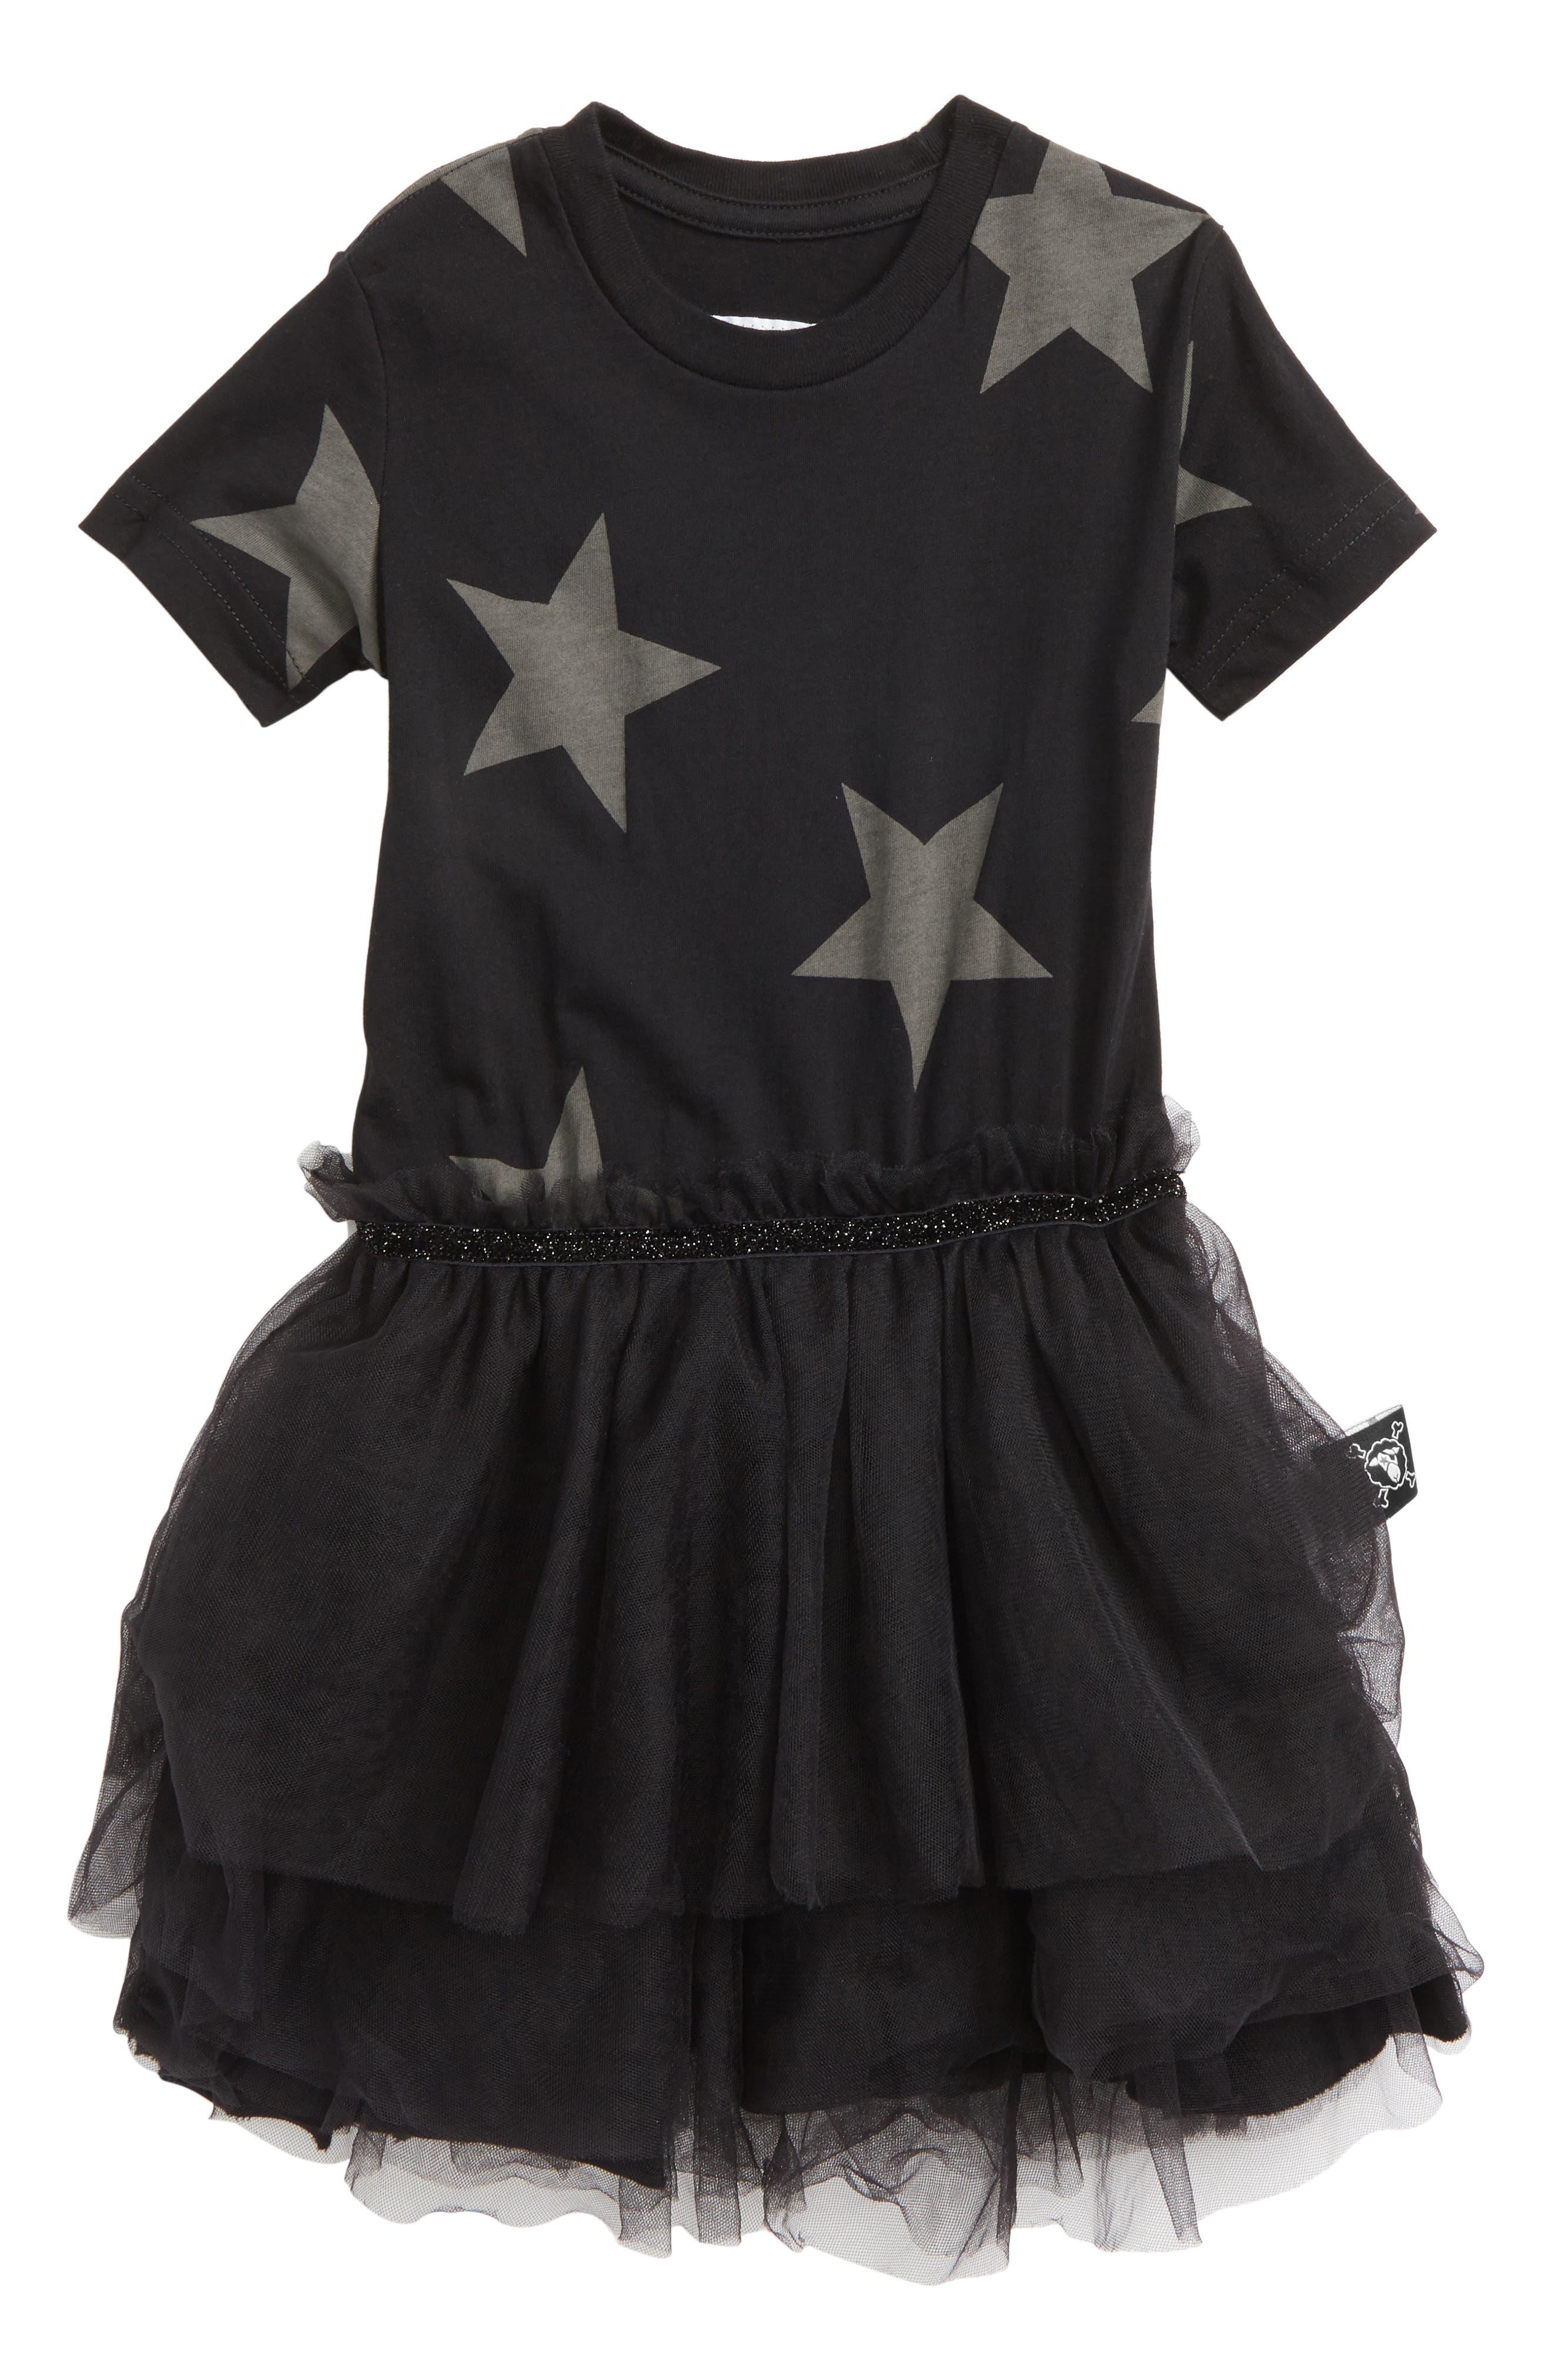 Star Tulle Dress,                             Main thumbnail 1, color,                             001